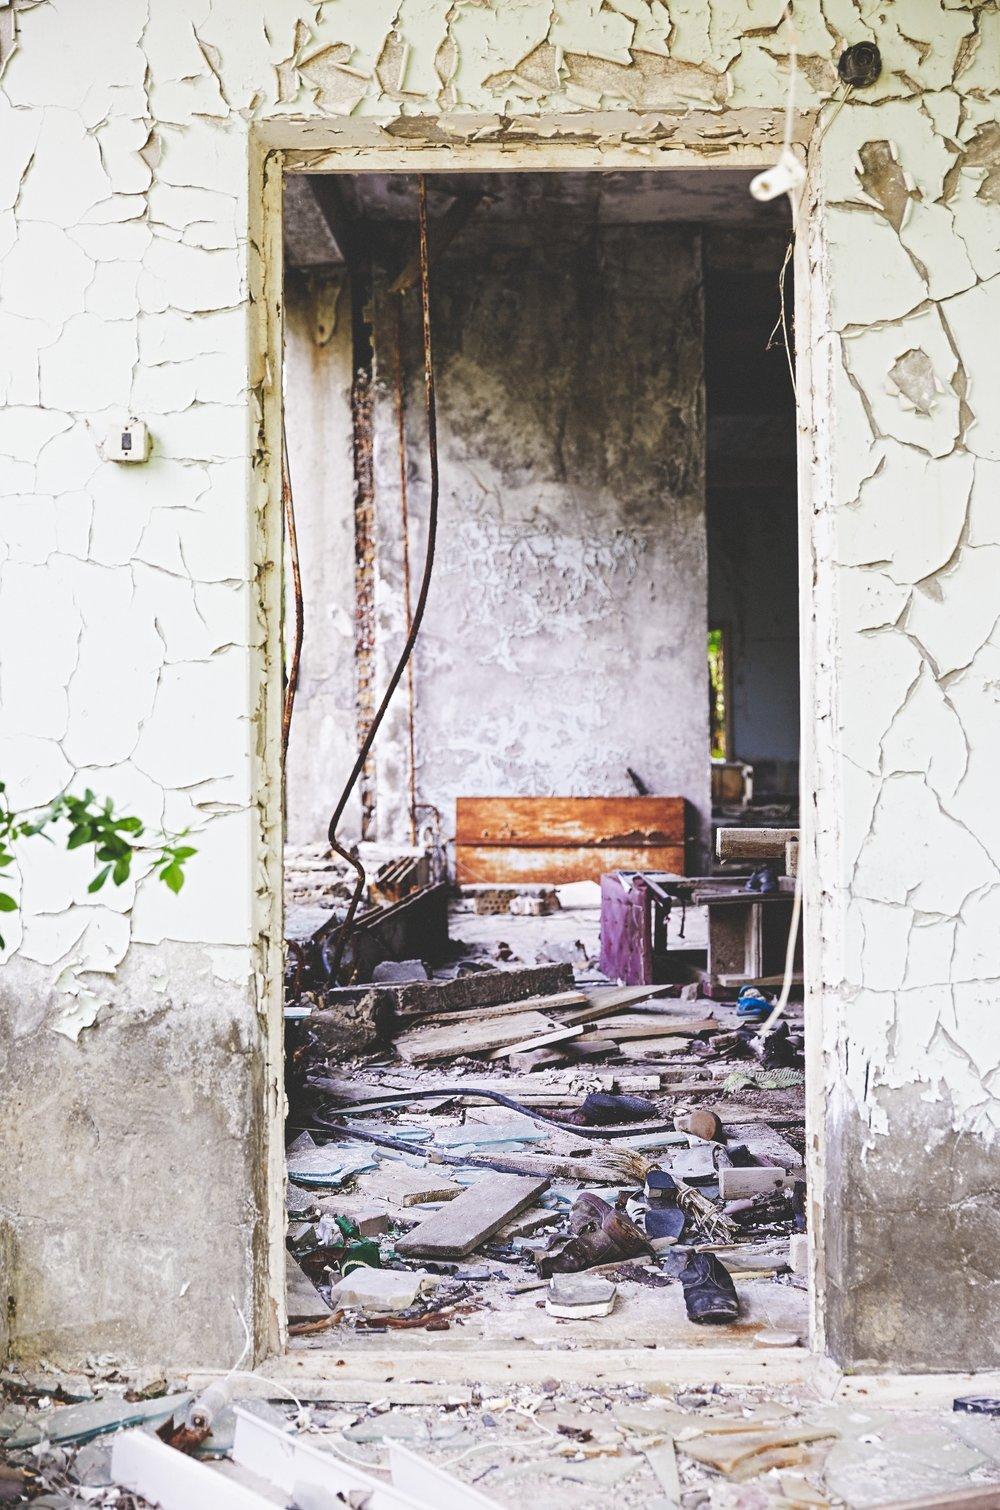 0H9A0184Chernboyl Pripyat Foto Emily Dahl.jpg